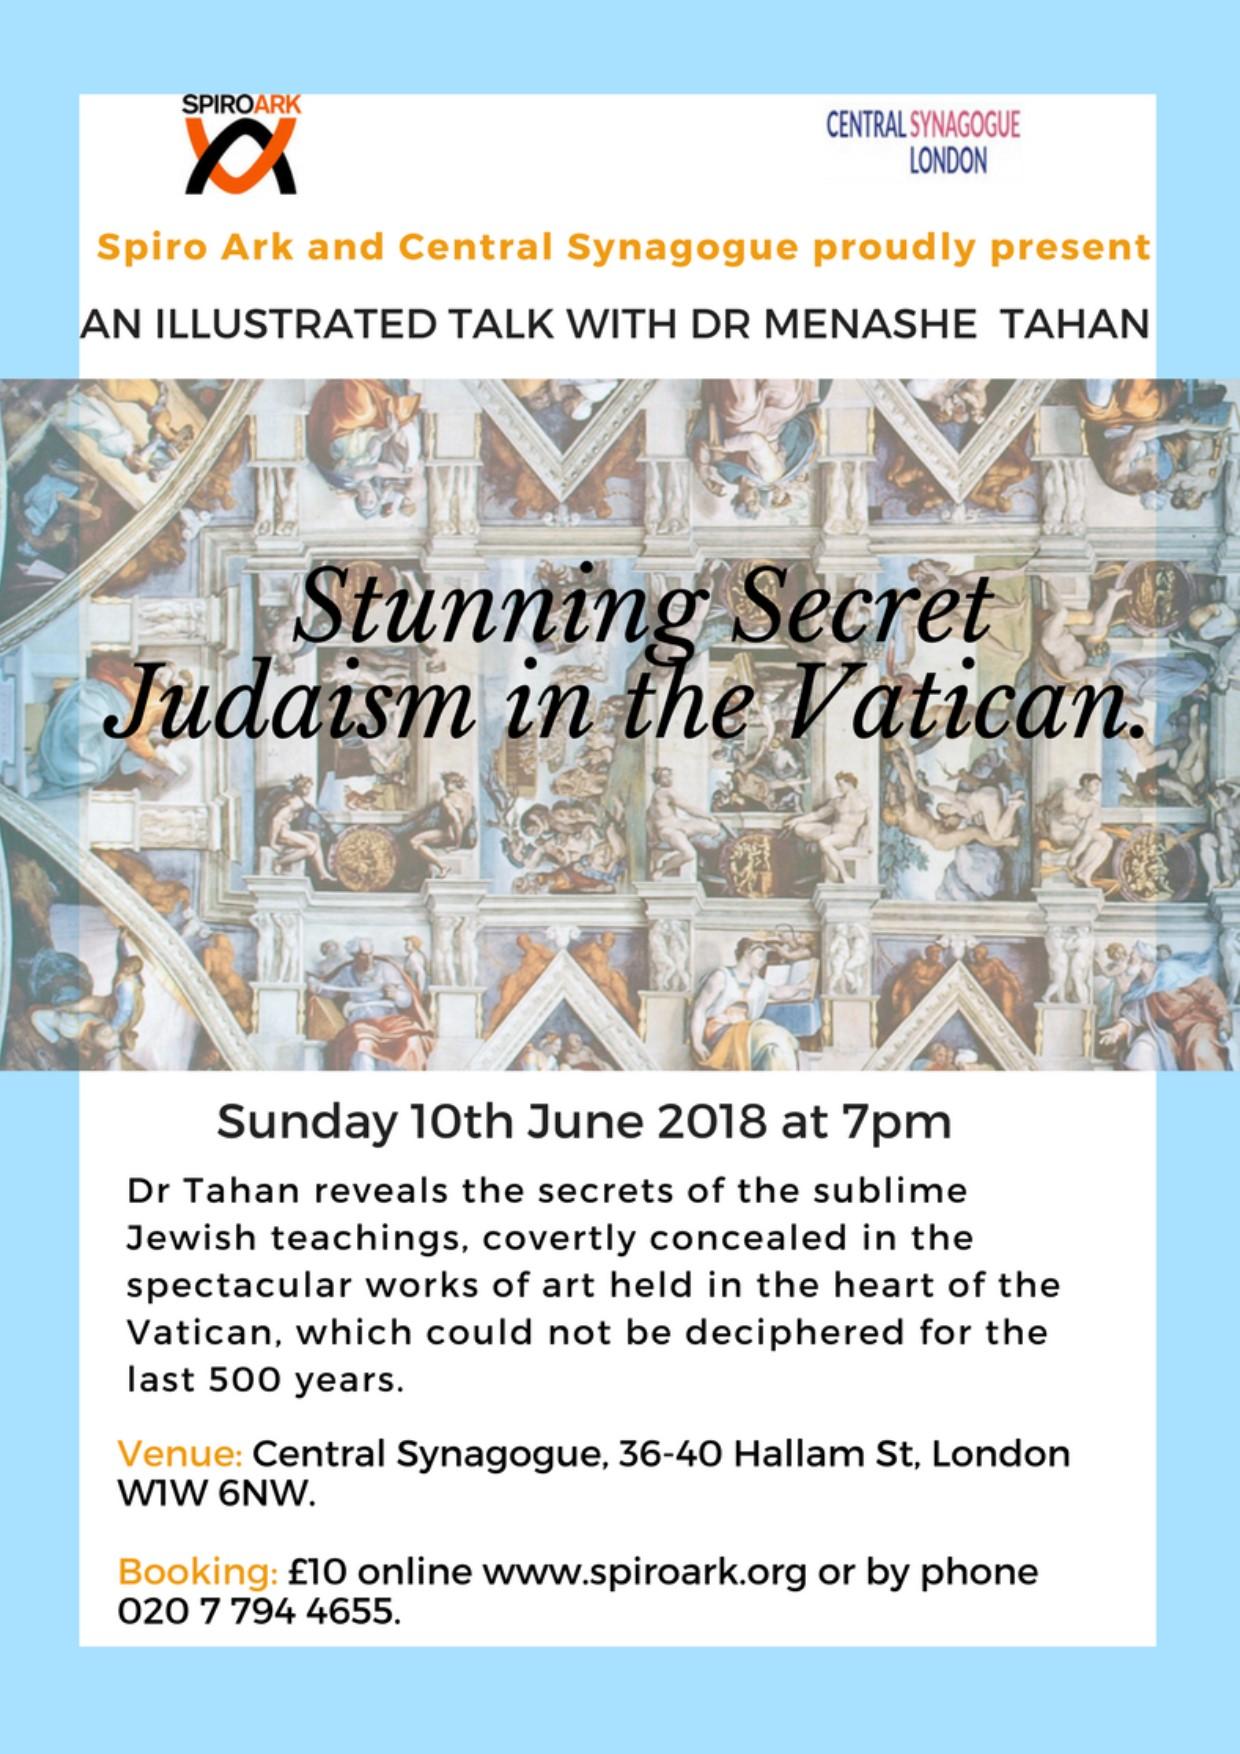 STUNNING SECRET JUDAISM IN THE VATICAN